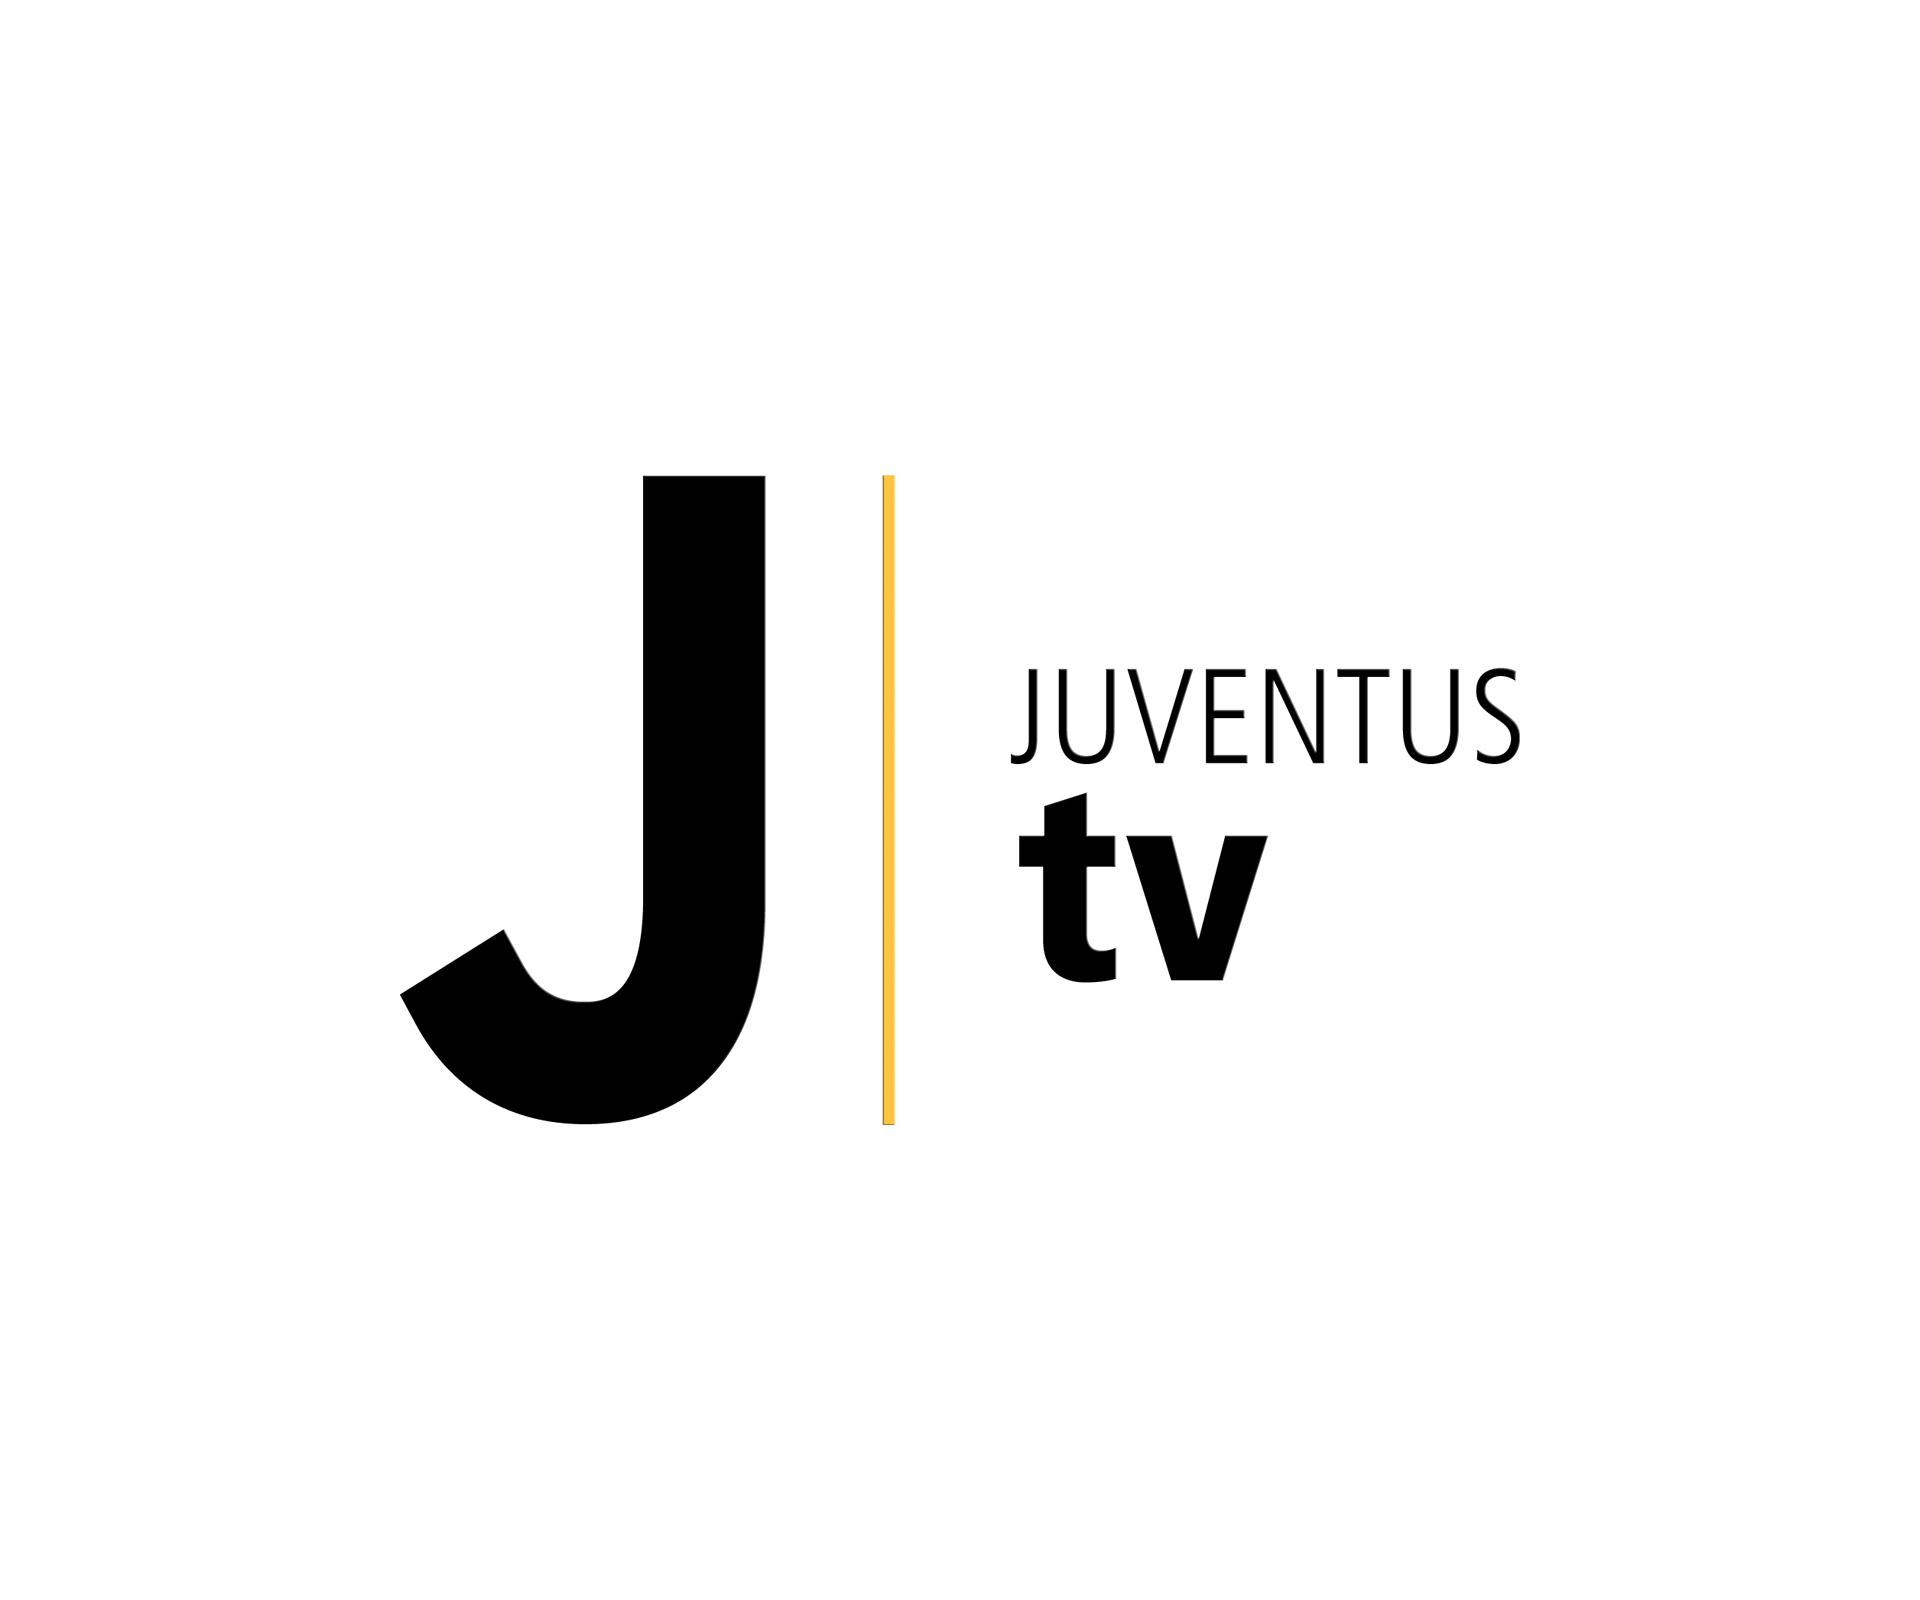 file juventus tv 2013 logo jpg wikimedia commons https commons wikimedia org wiki file juventus tv 2013 logo jpg